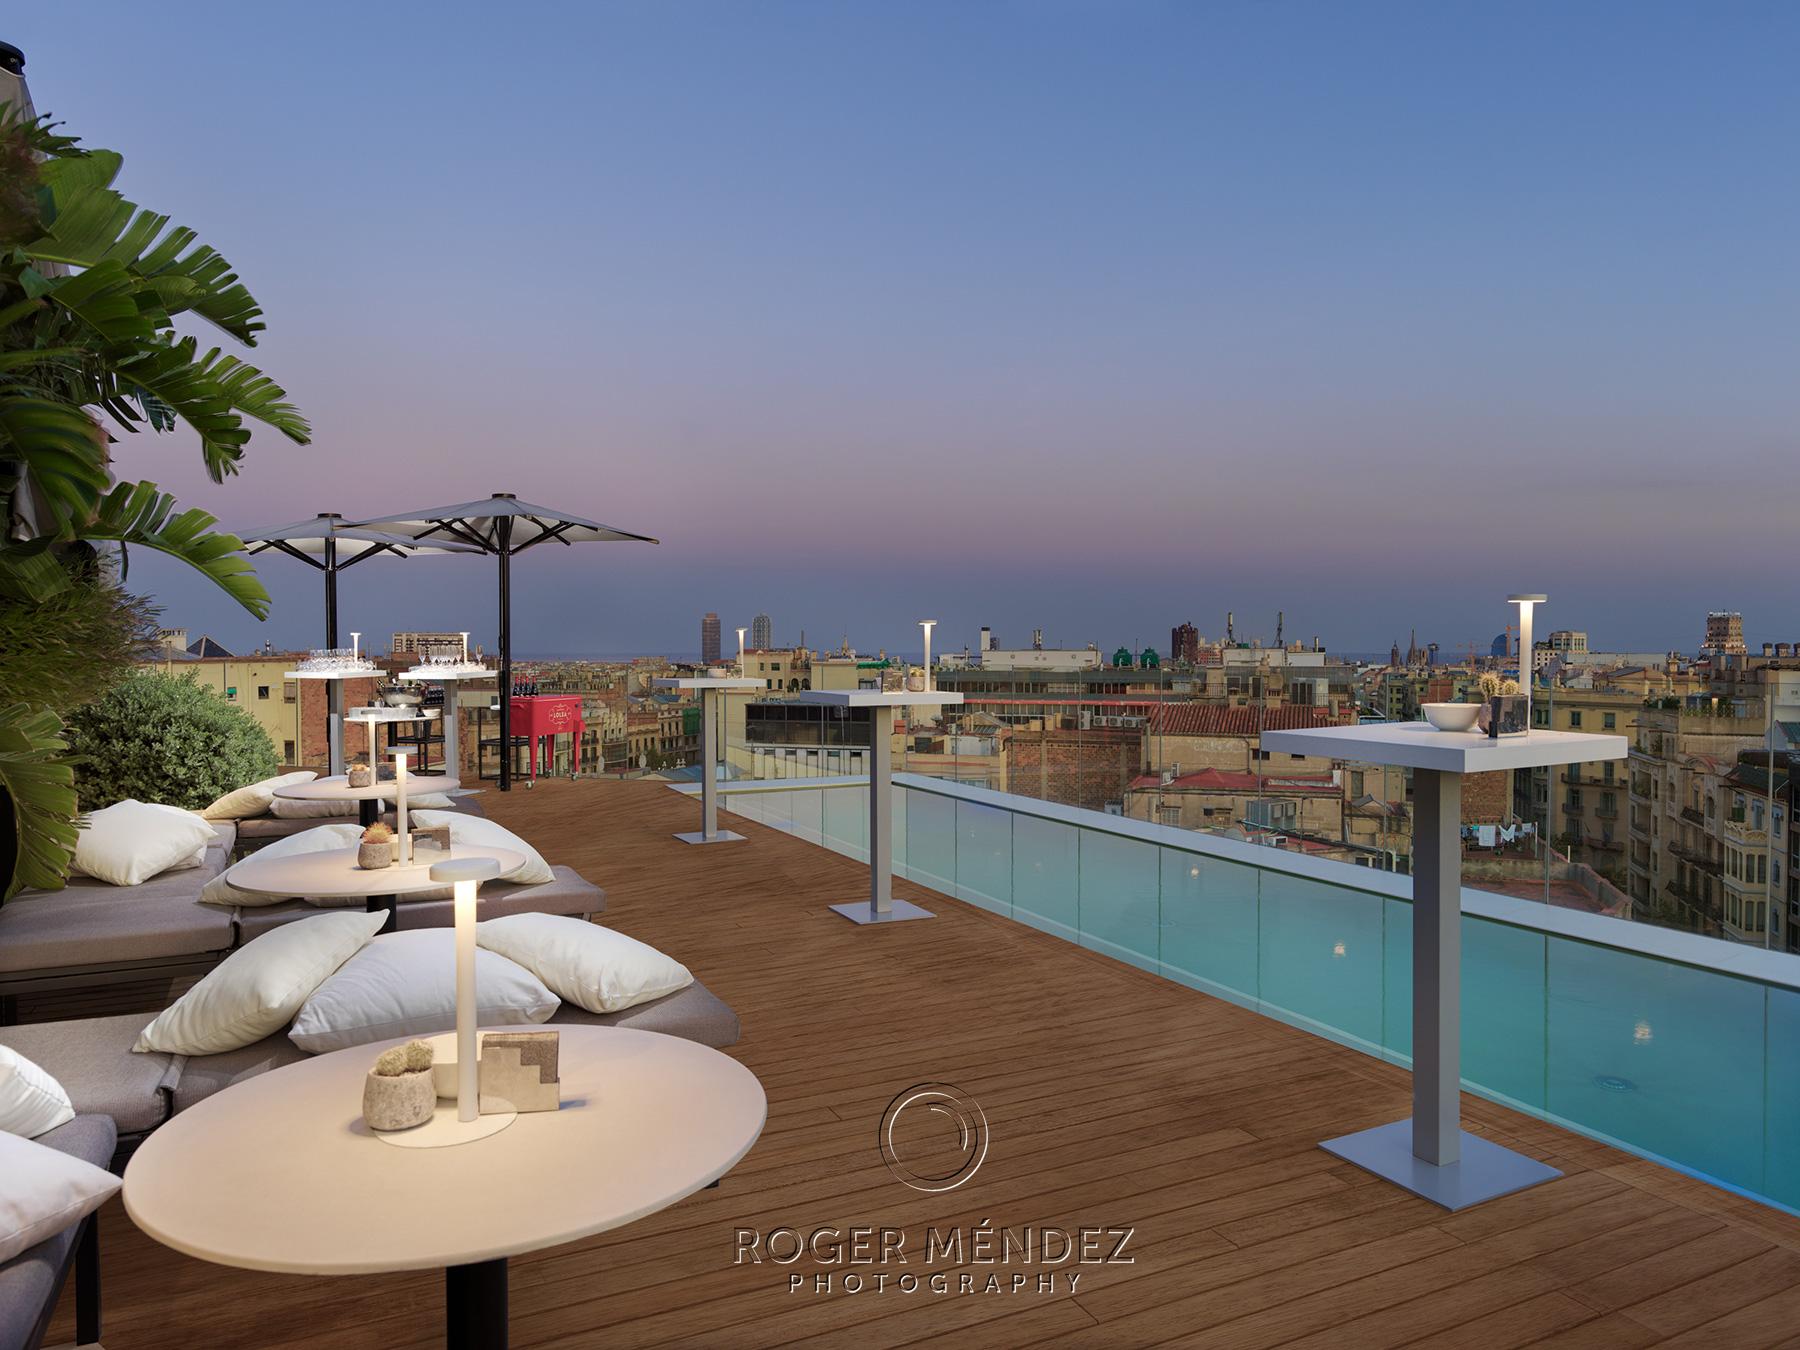 Terraza Moods. Montaje Cocktail. The One Barcelona